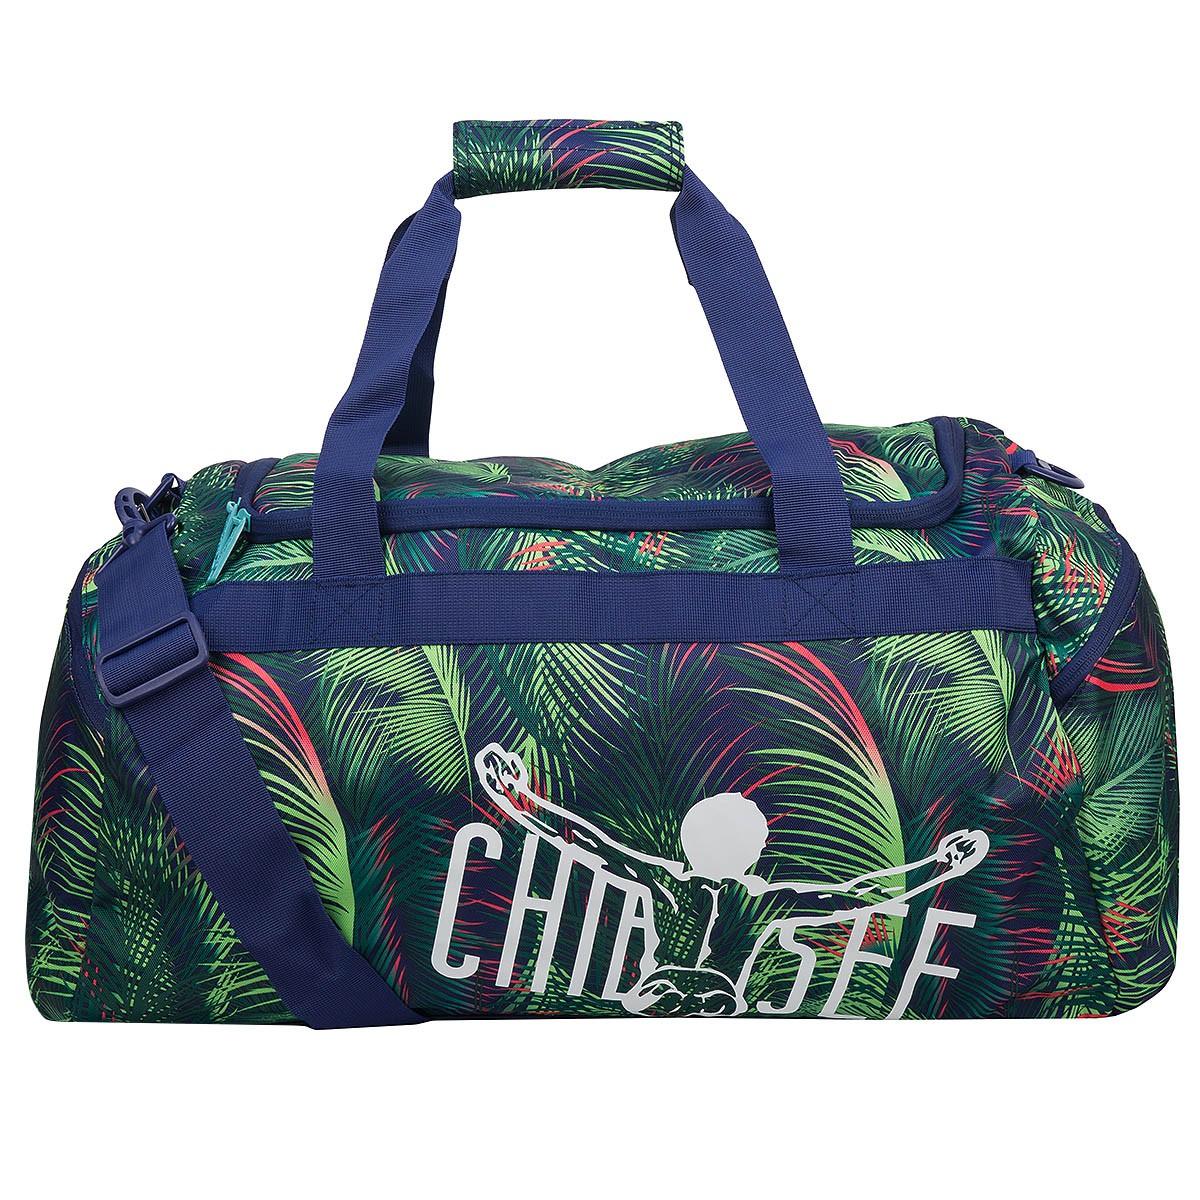 15a259a2ff432 Chiemsee Matchbag Large Reisetasche Sporttasche Weekender ...